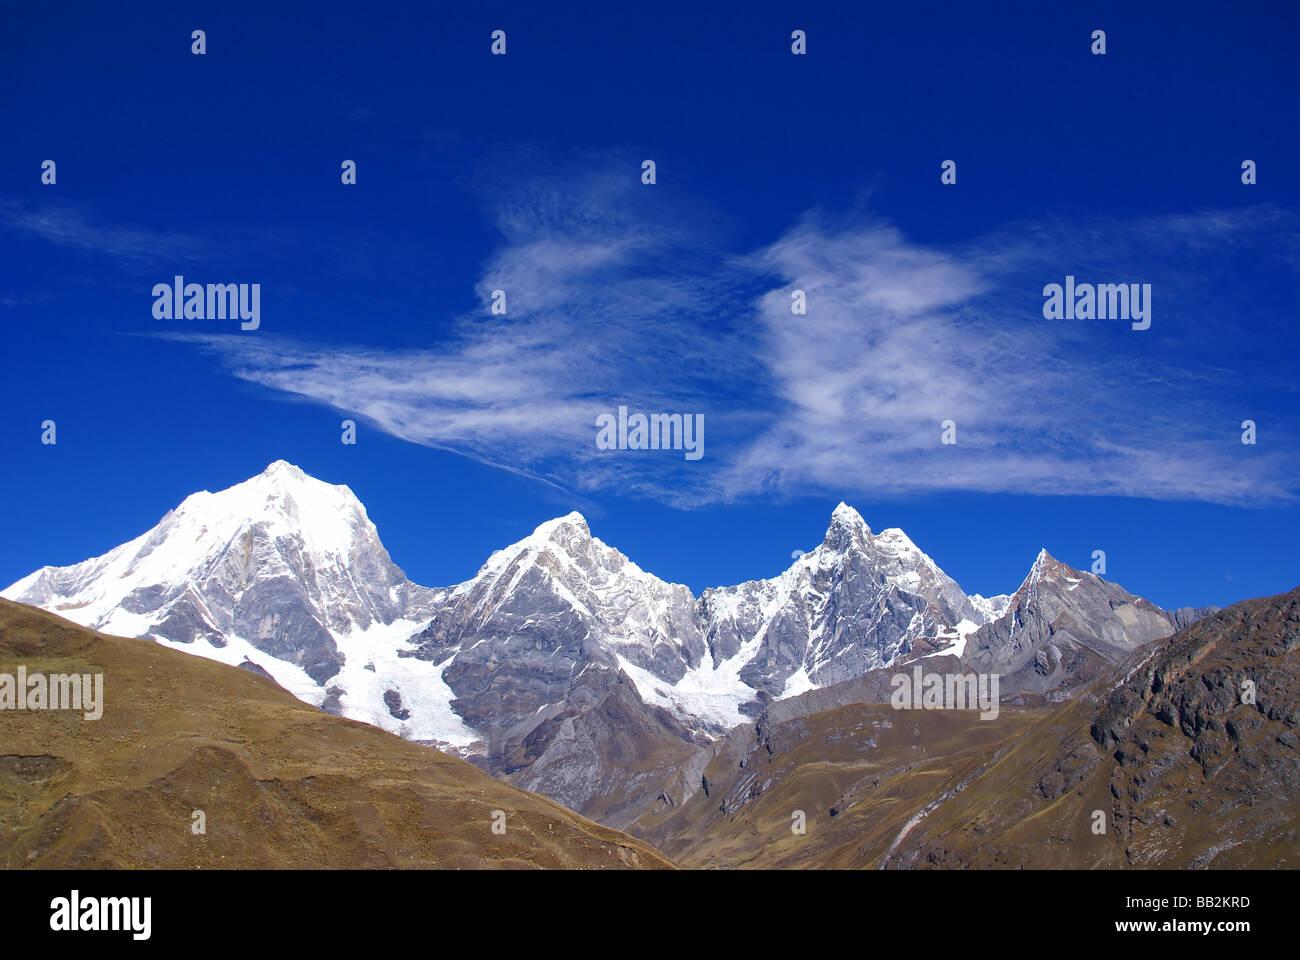 Siula Yerupaja Jirishanca Cordillera Huayhuash Andes Peru South America - Stock Image